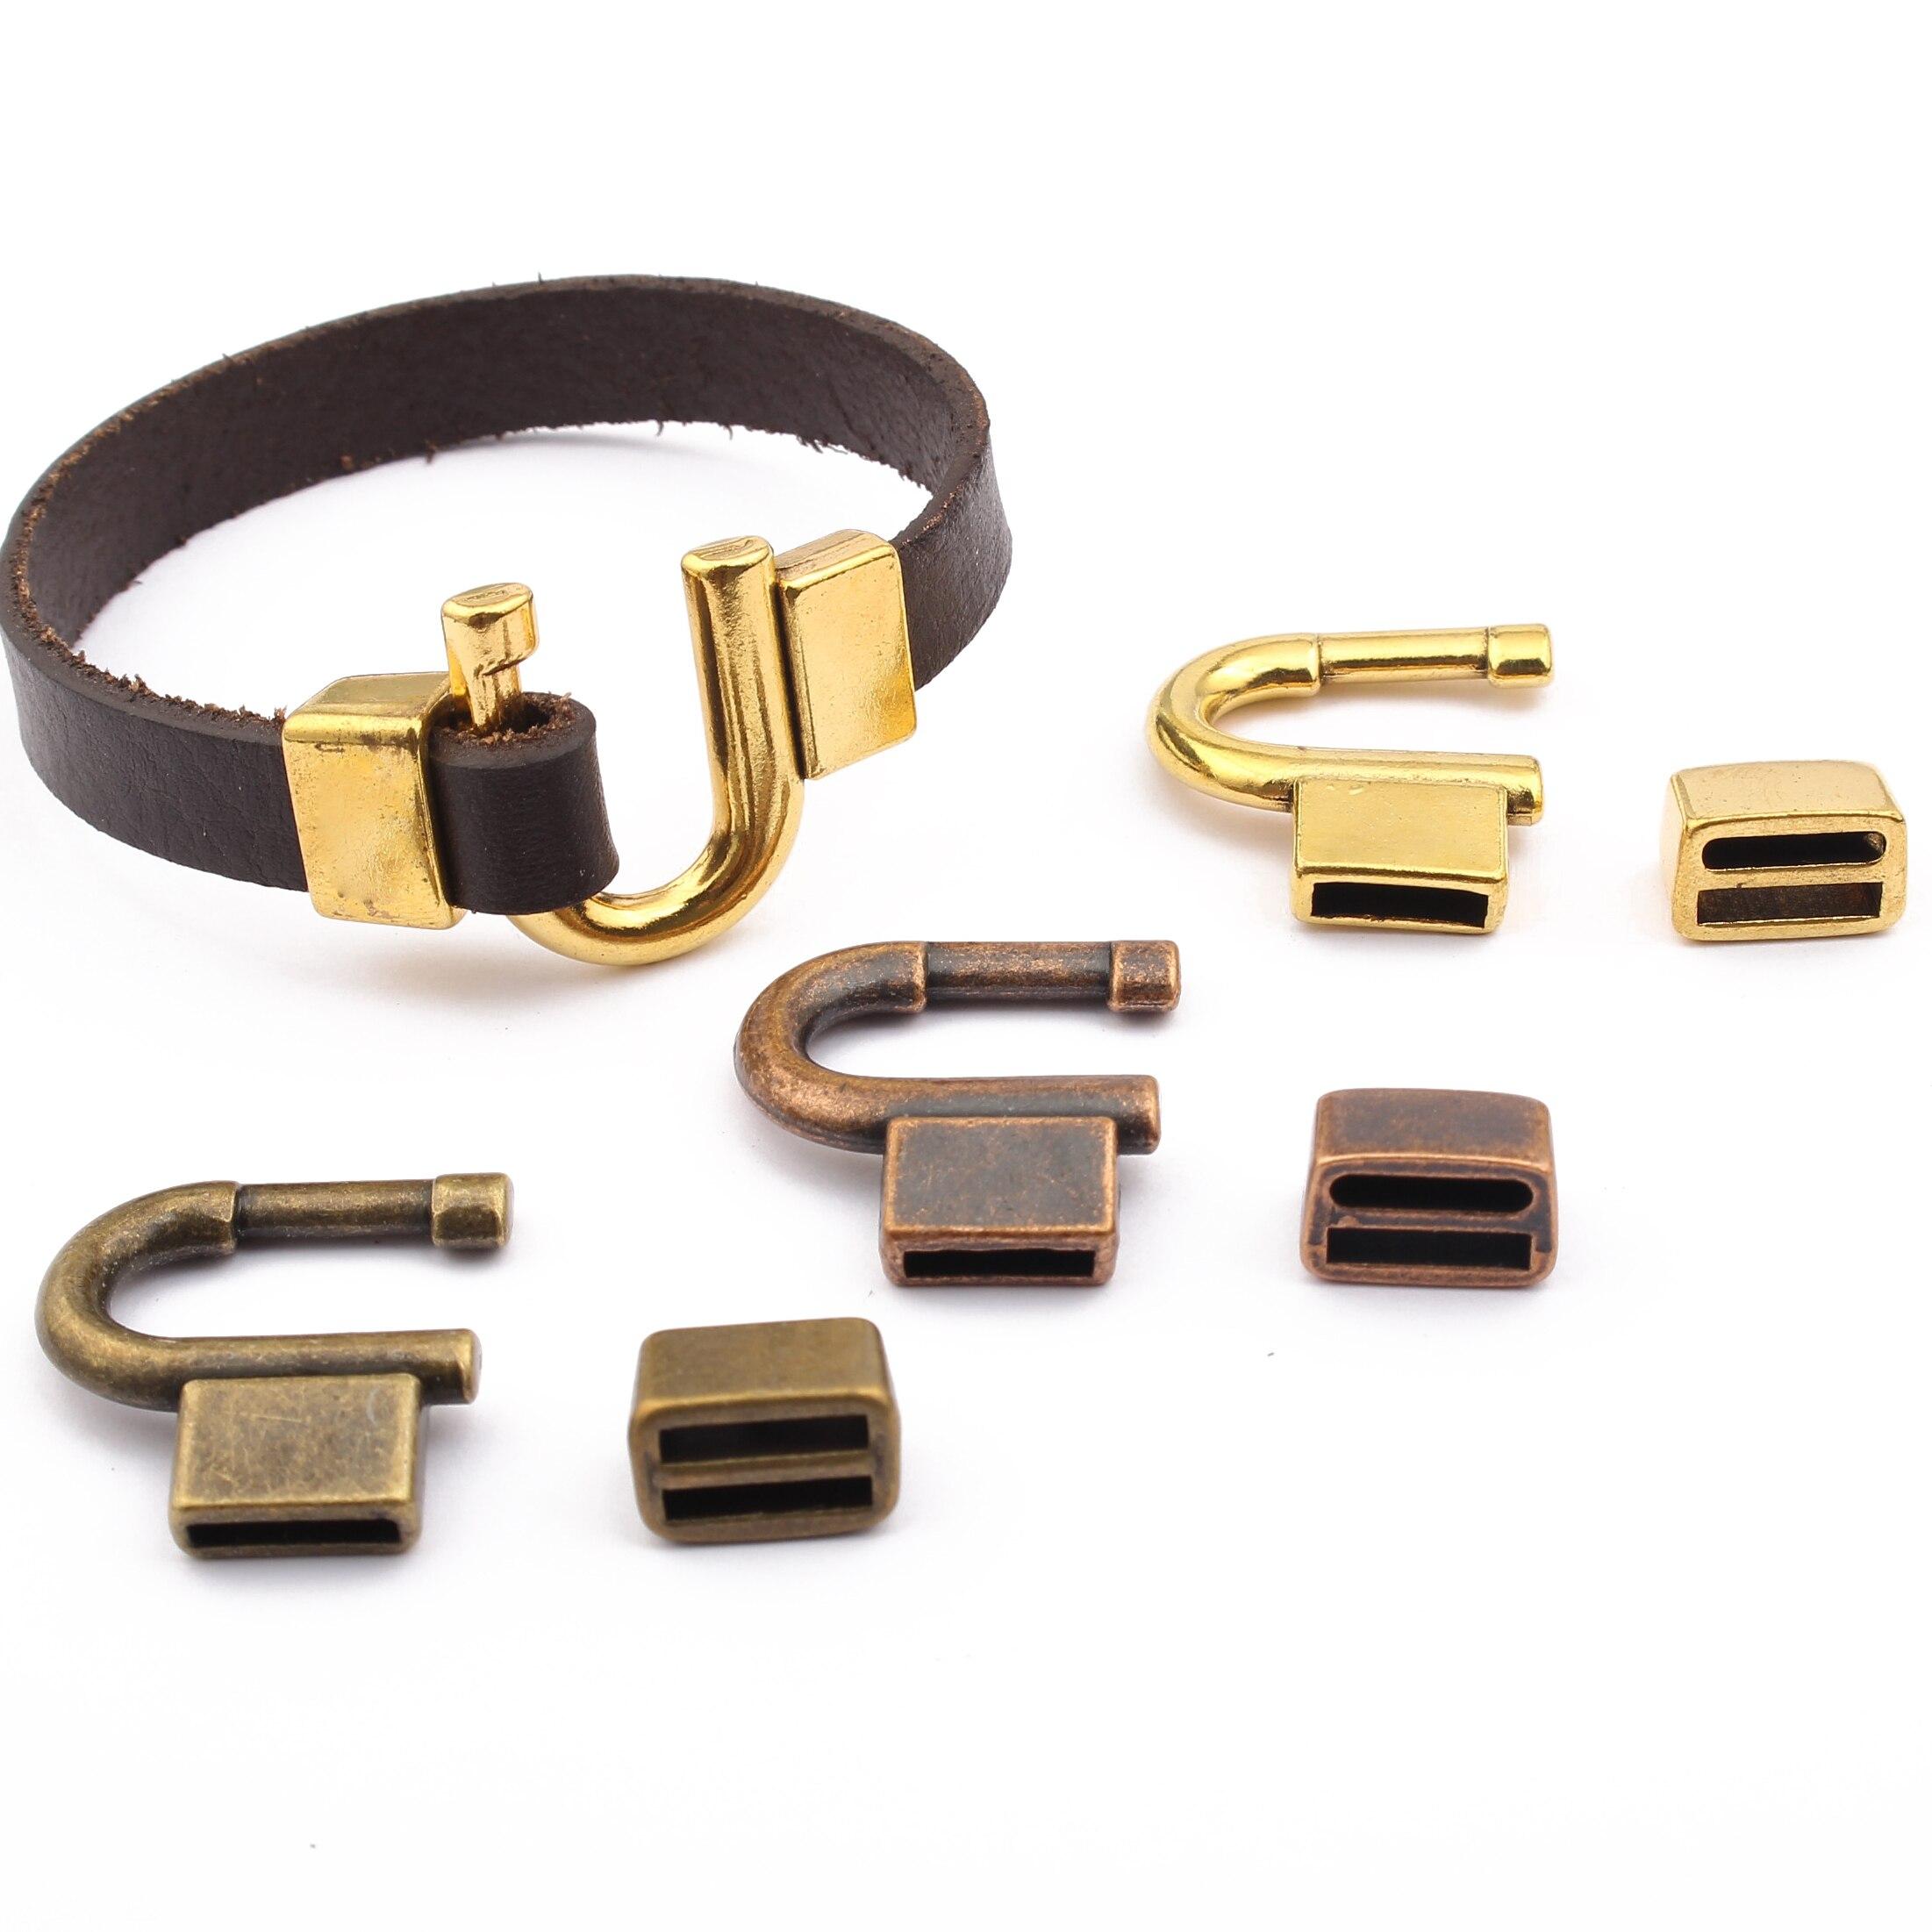 3 ensembles fer à cheval crochet fermoir 10x2mm U pointe pointu plat curseur fermoir pour 10mm ou 5mm cuir plat